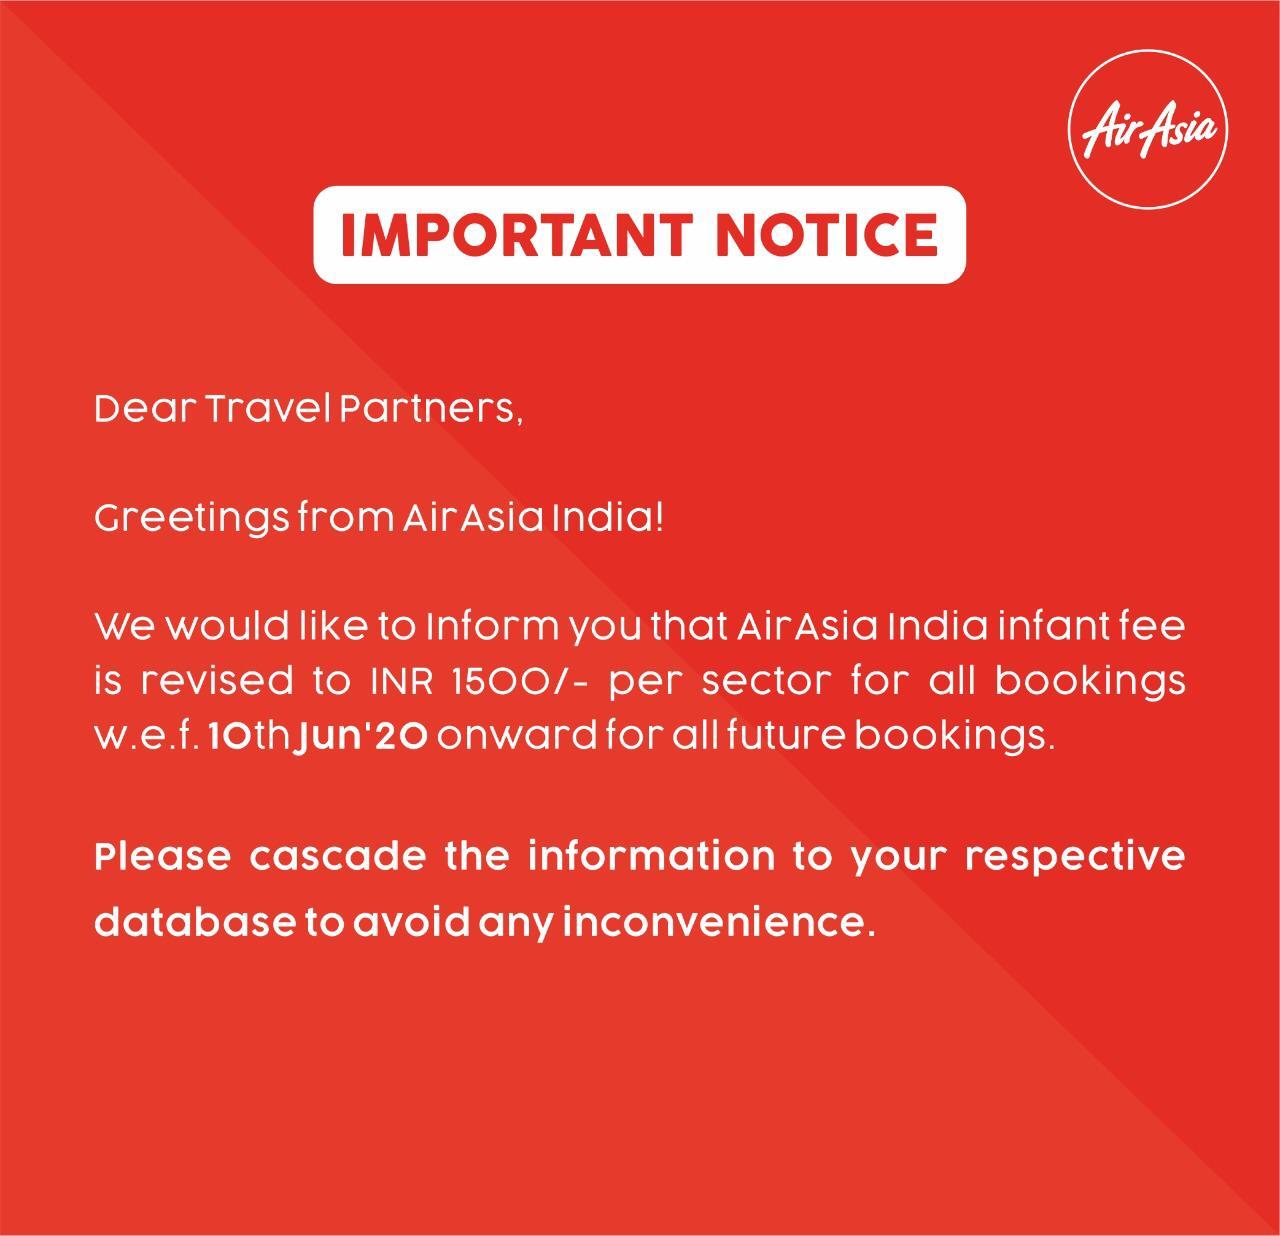 AirAsia Update